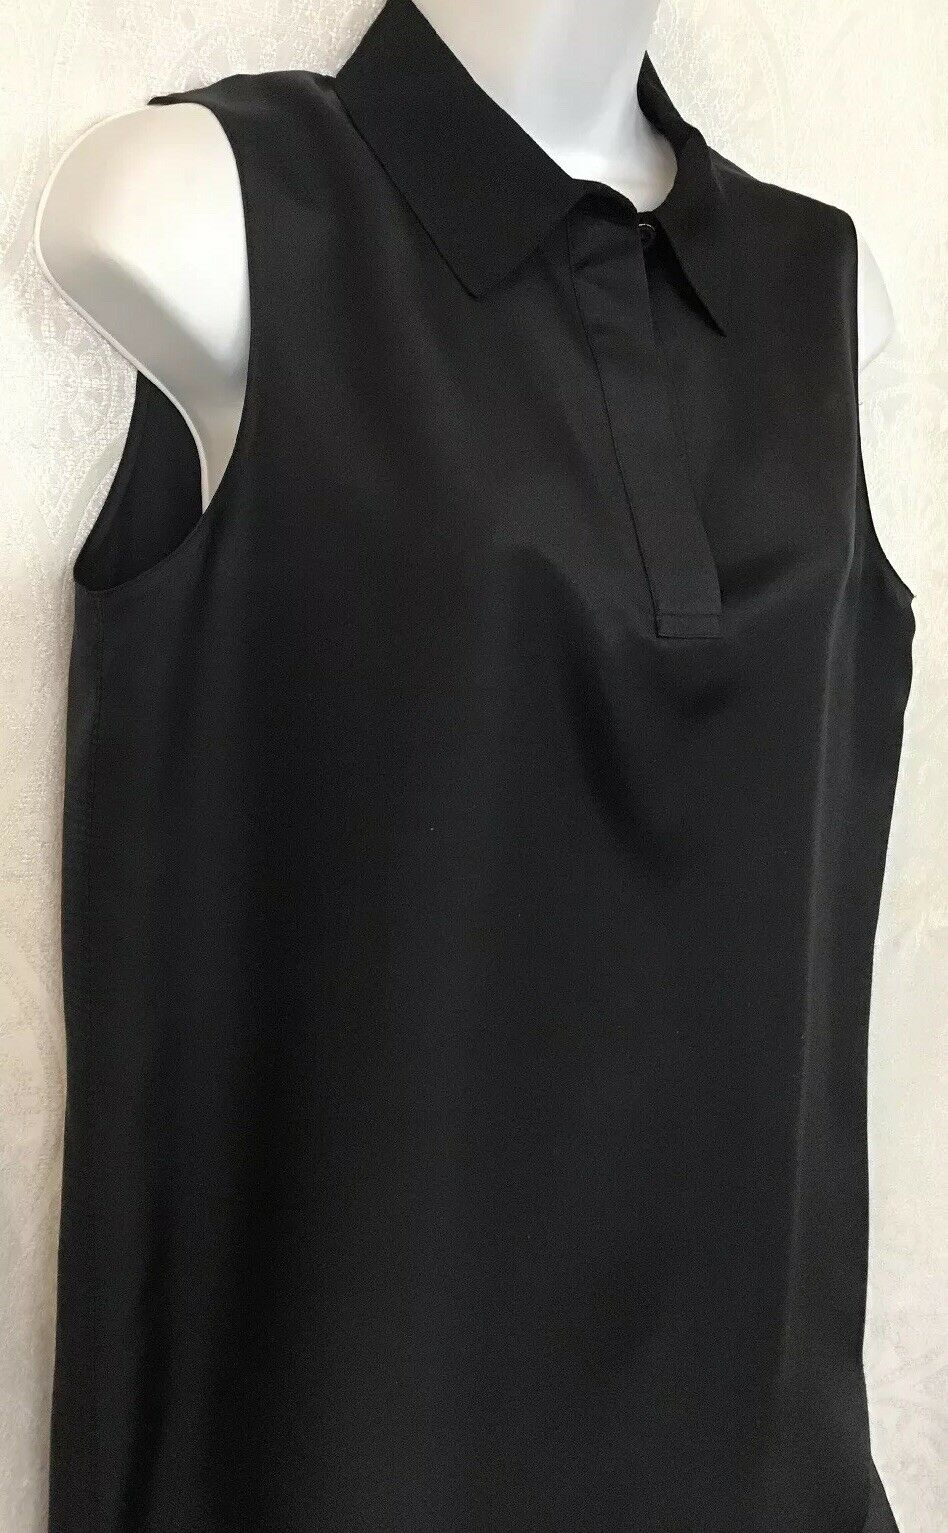 Rag And Bone Blouse Black Silk Sleeveless Three B… - image 2